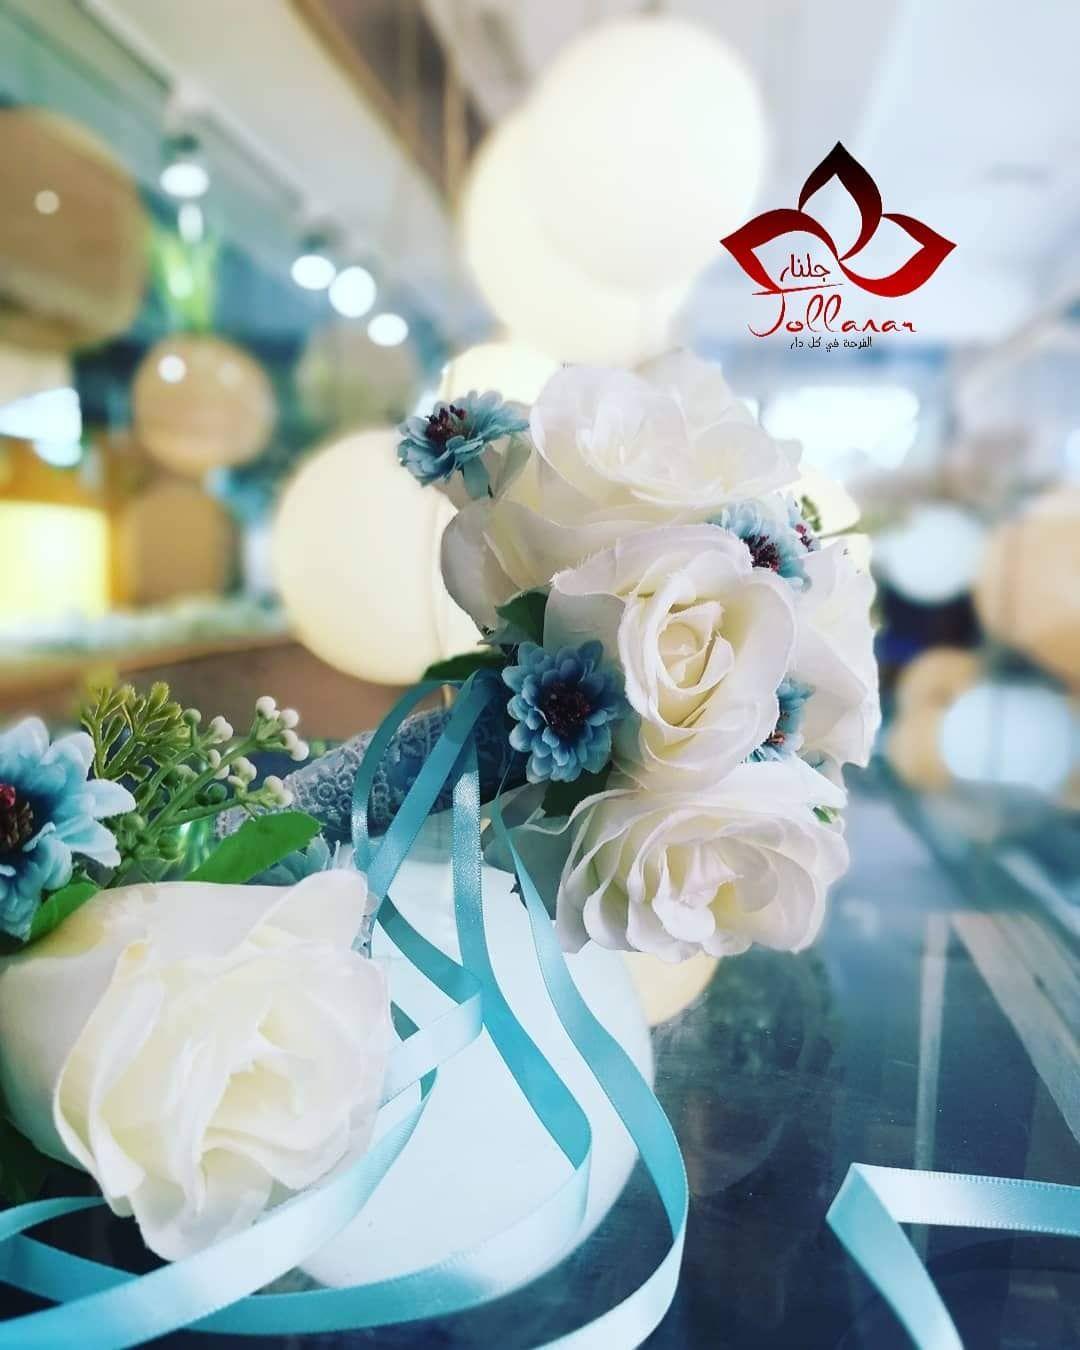 Bonjour La Classe Bouquet Made By Jollanar جلنار الفرحة في كل دار جلنار الفرحة في كل دار Jollanar Creation Flower Colors Blue White We